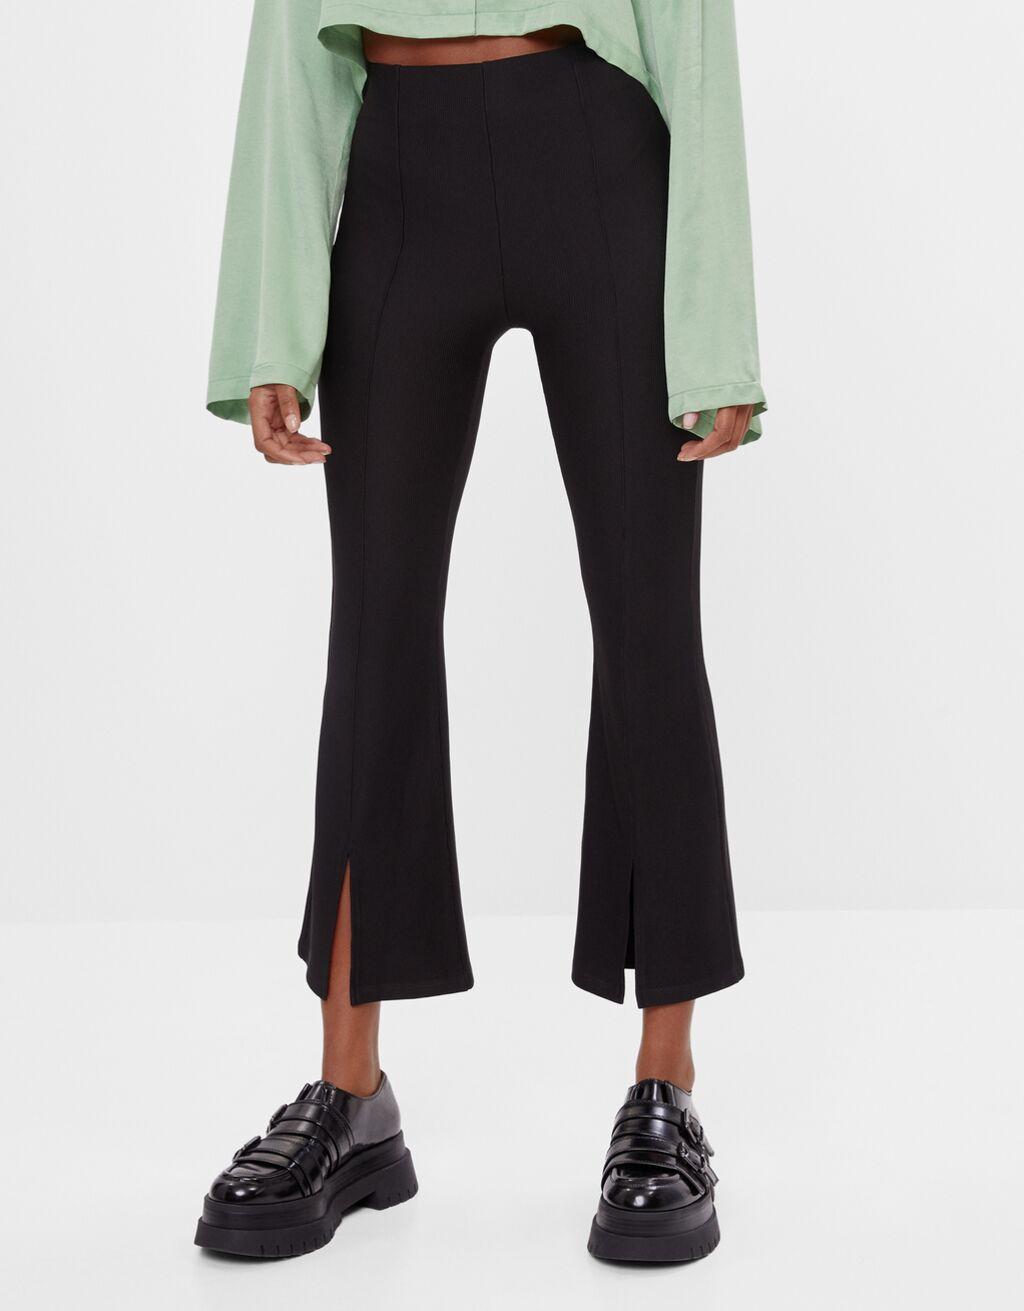 Kick Flare Ottoman trousers